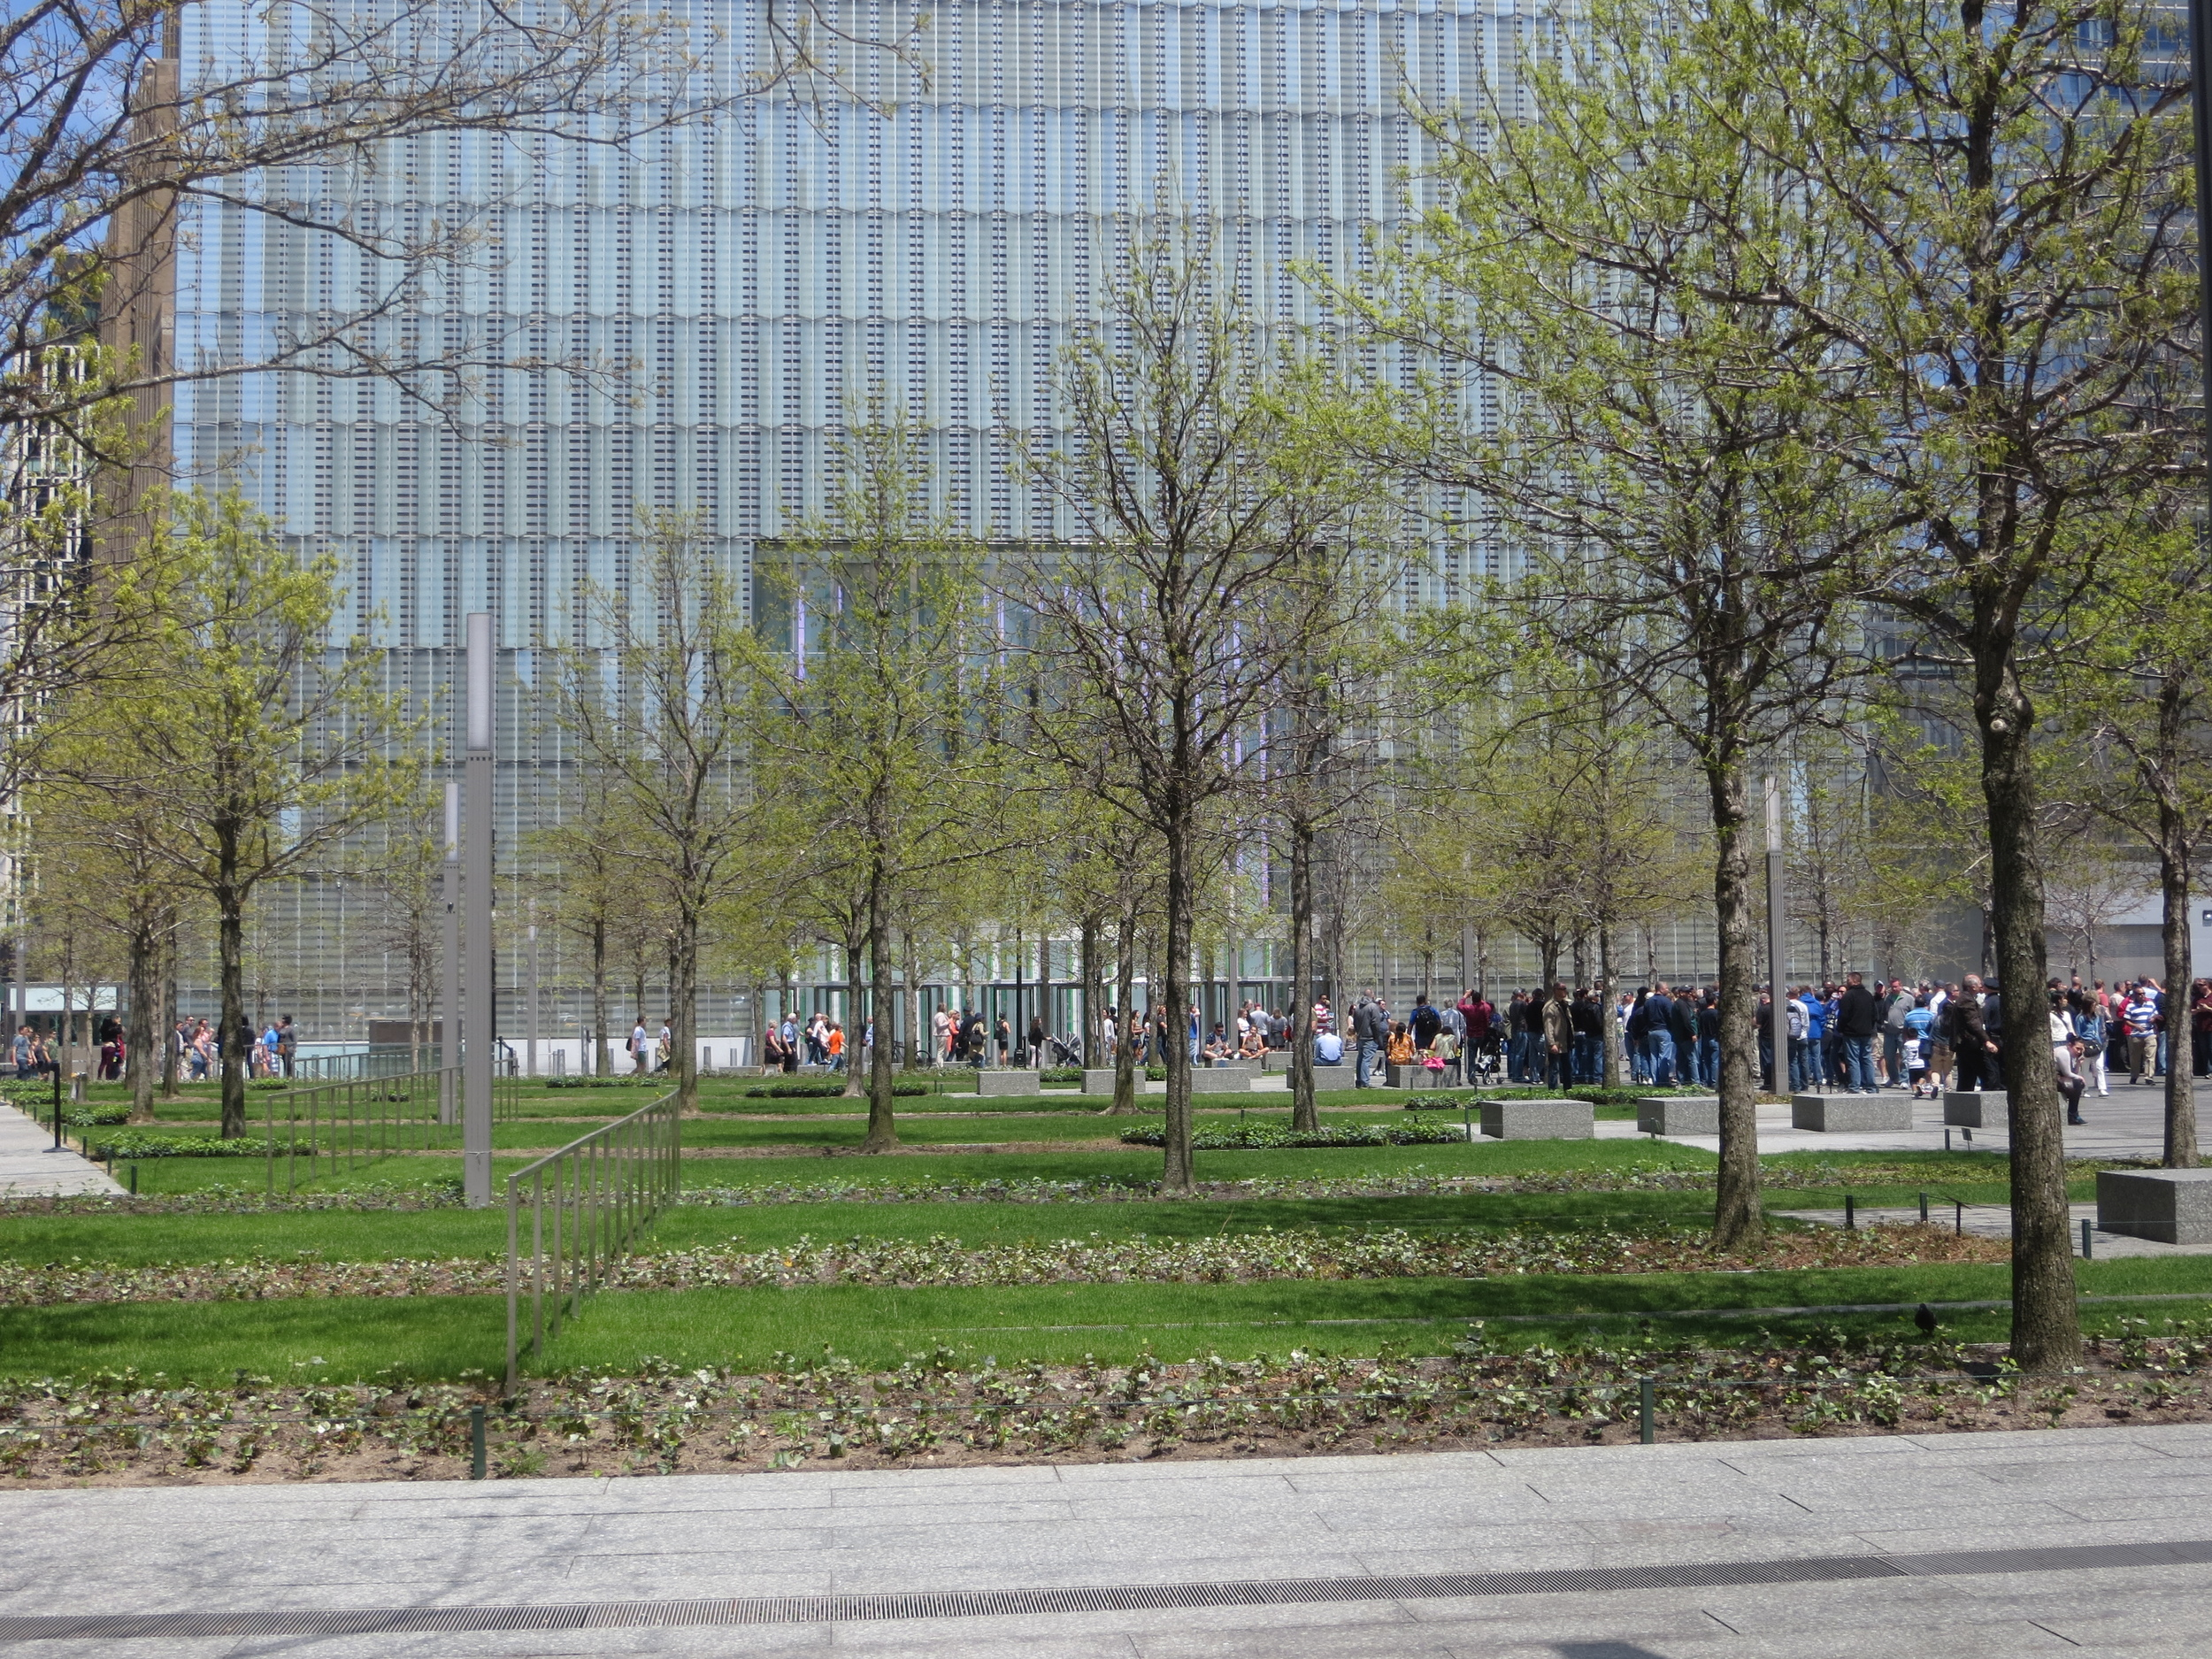 9/11 Memorial and 1 WTC base